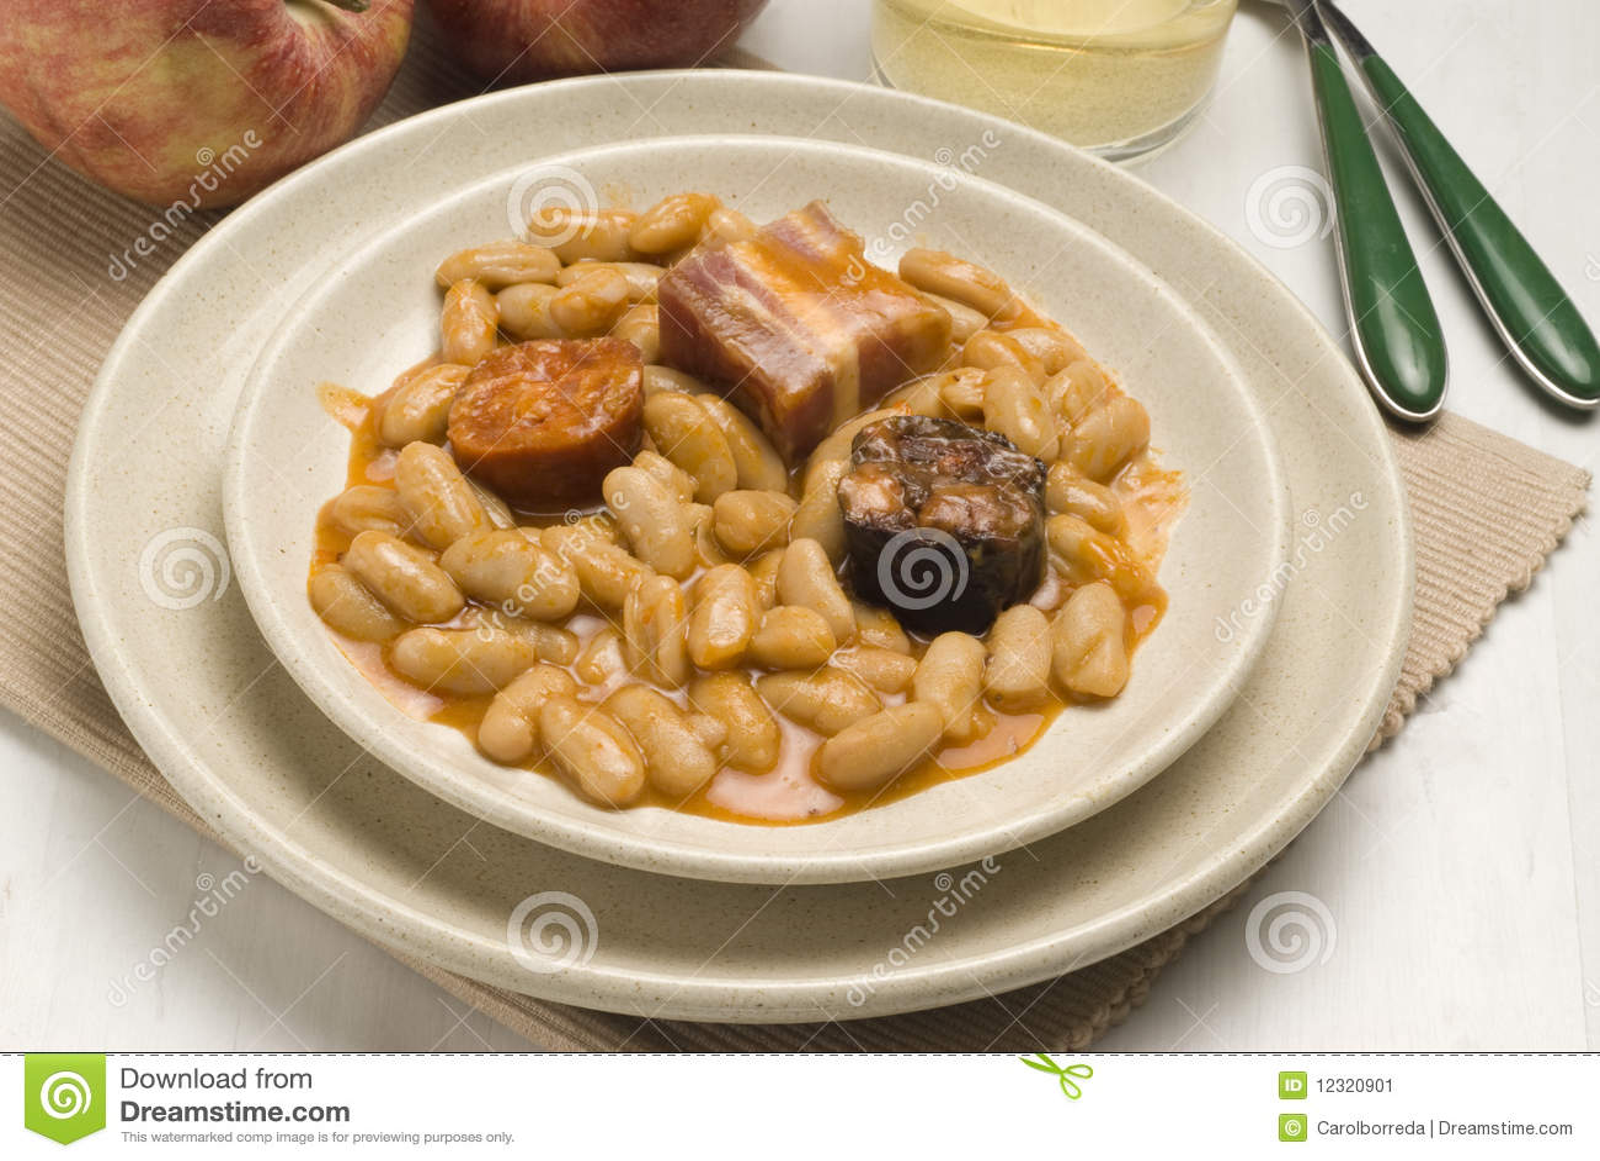 Ham and beans asturias style spanish cuisine fa stock for Asturias cuisine